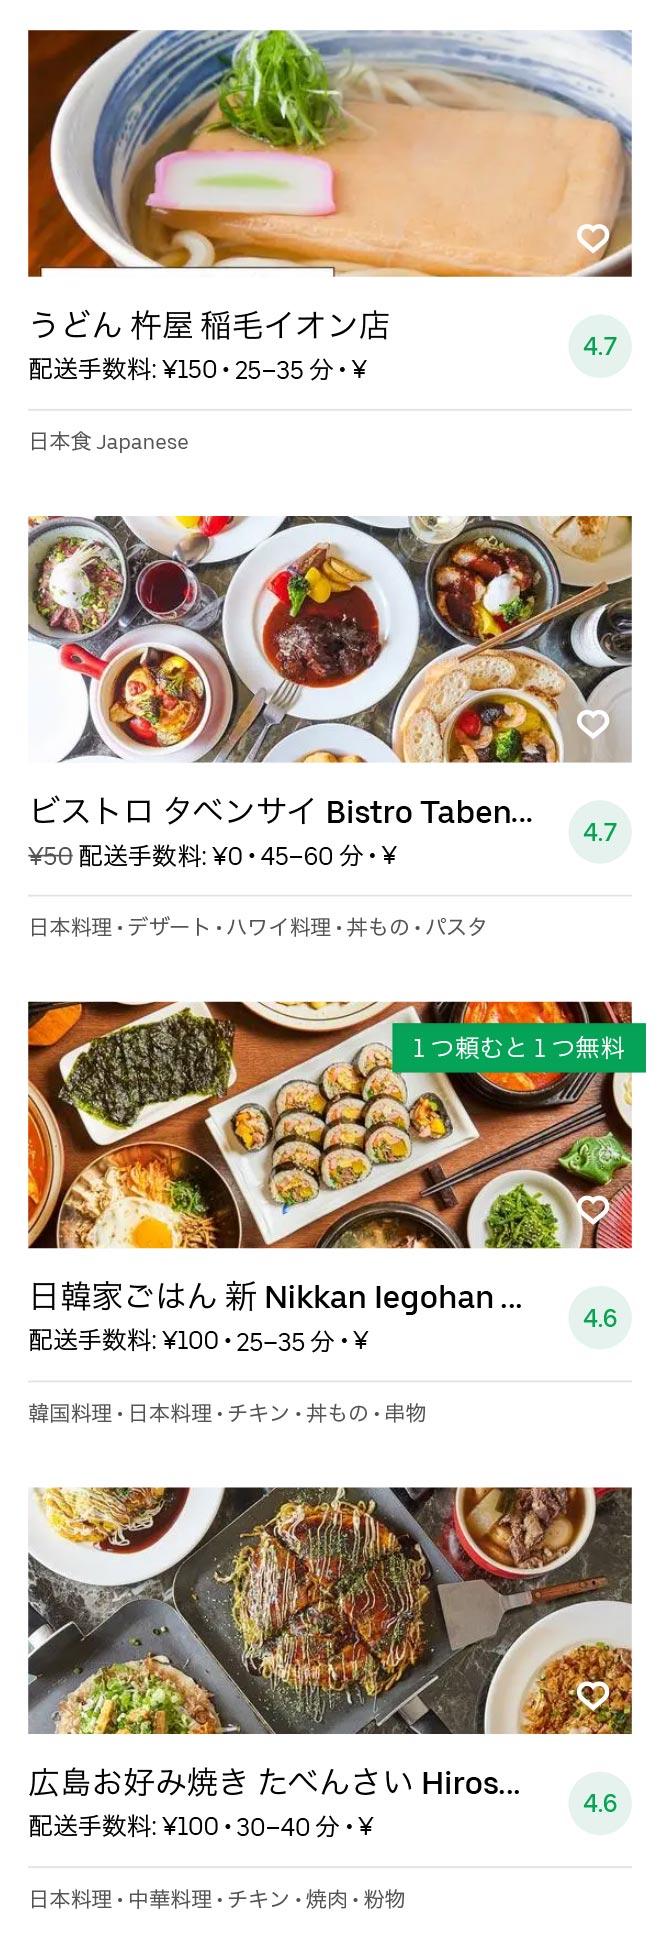 Inage menu 2010 02